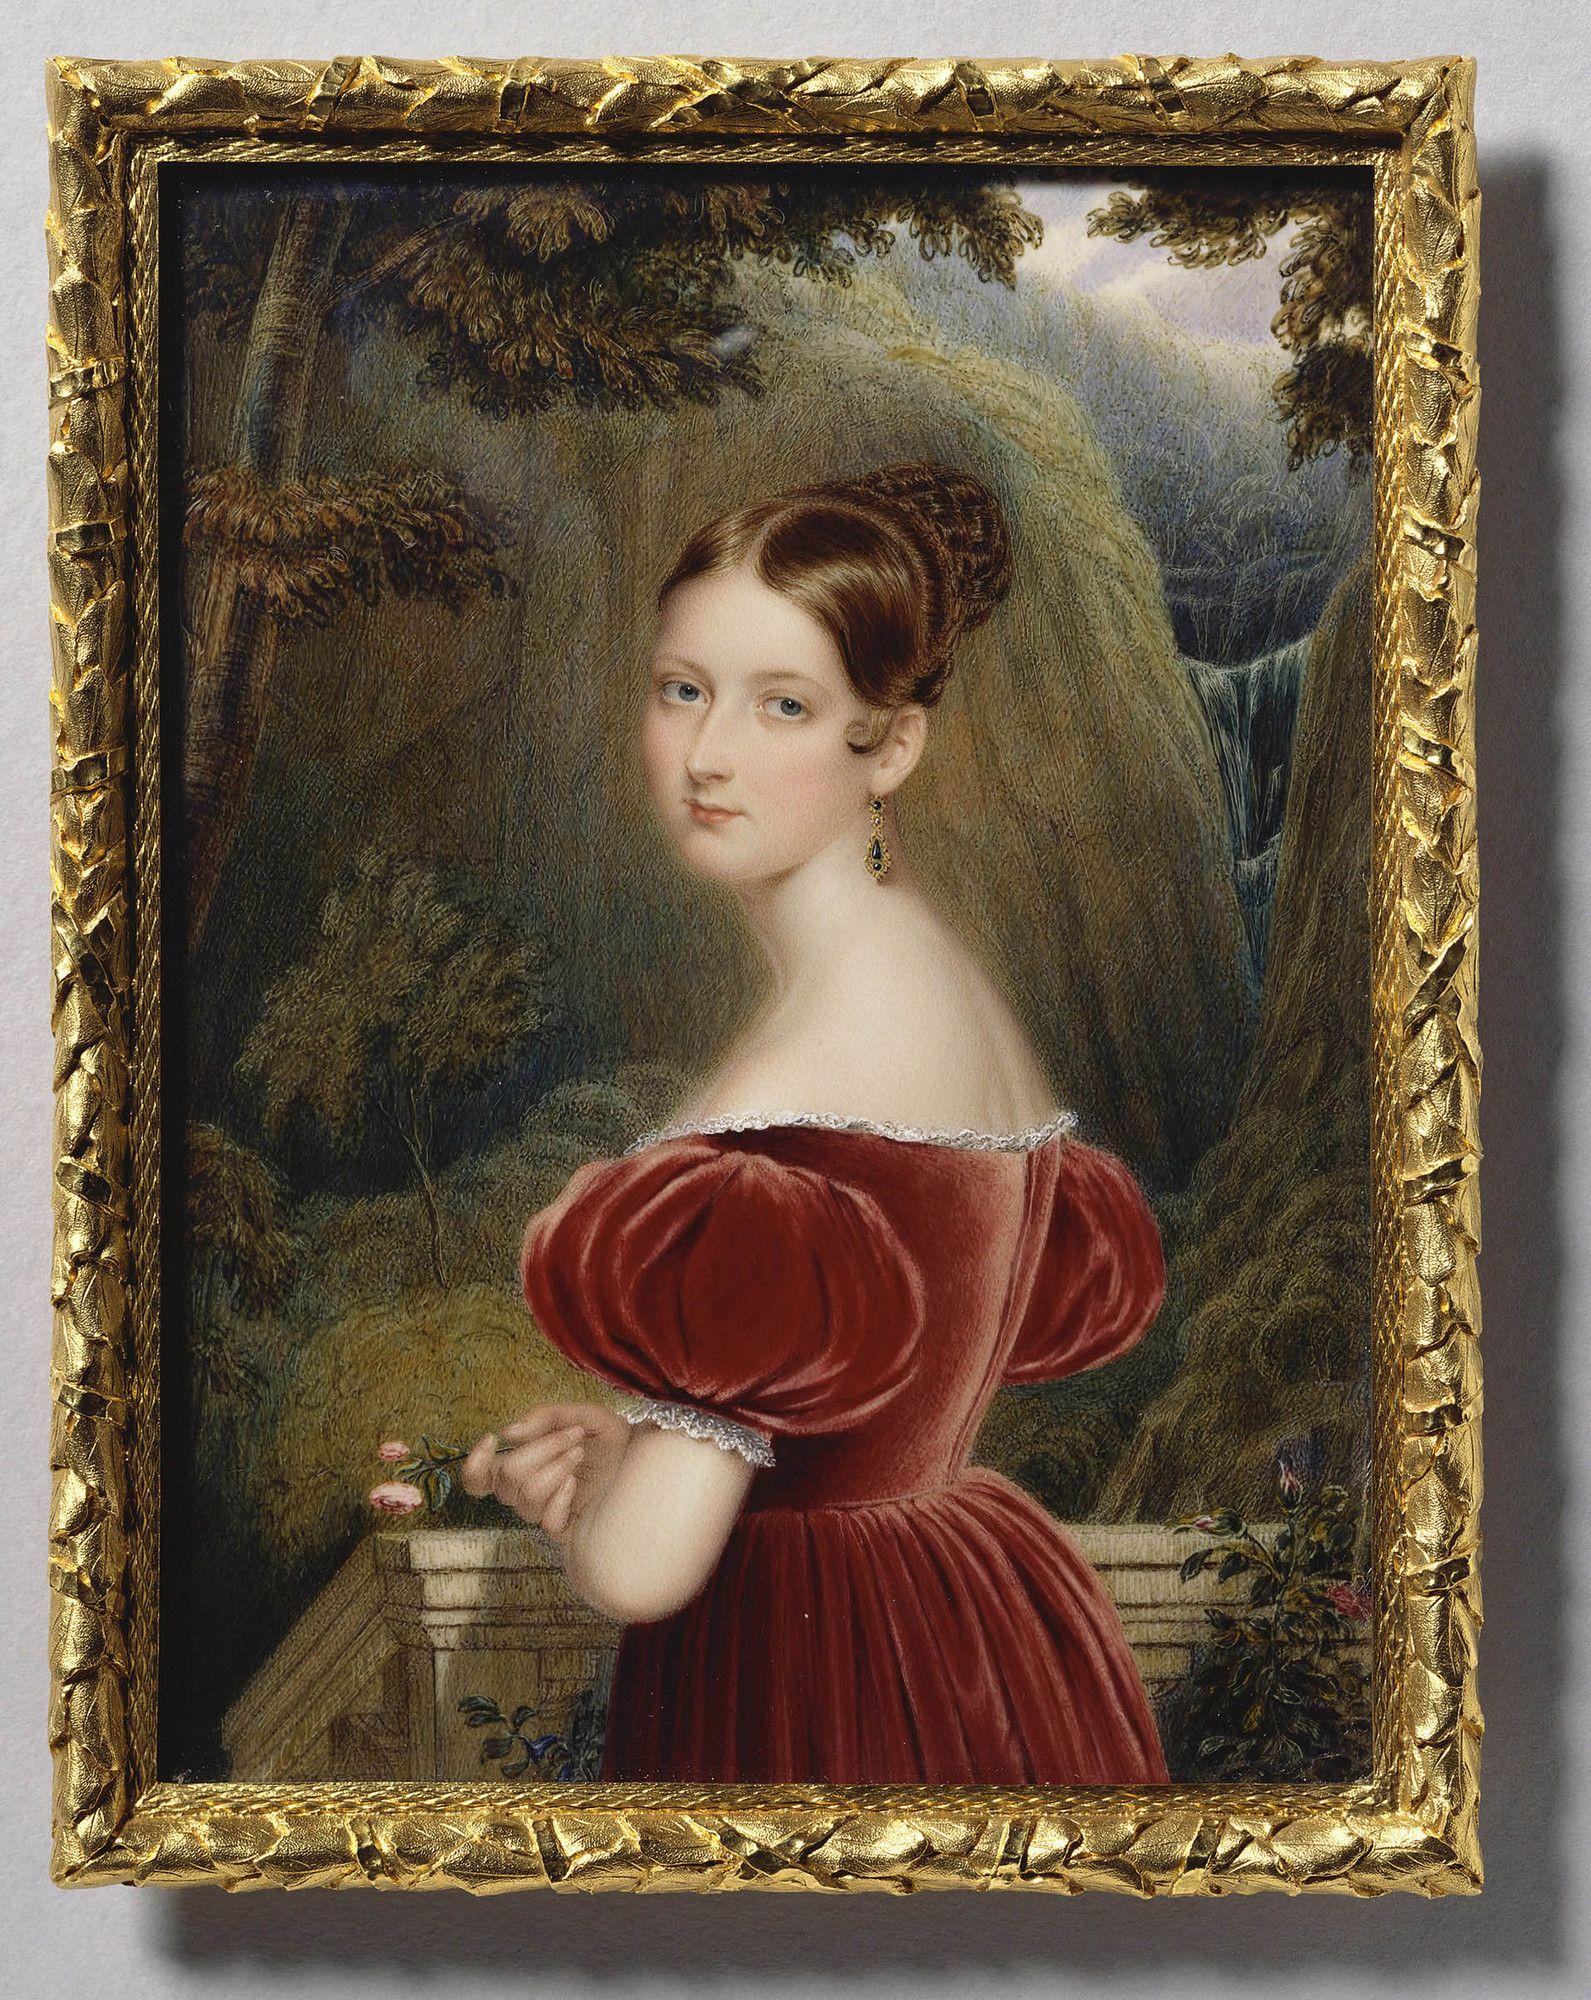 Queen Victoria (1819-1901), when Princess Victoria by Henry Collen 1836